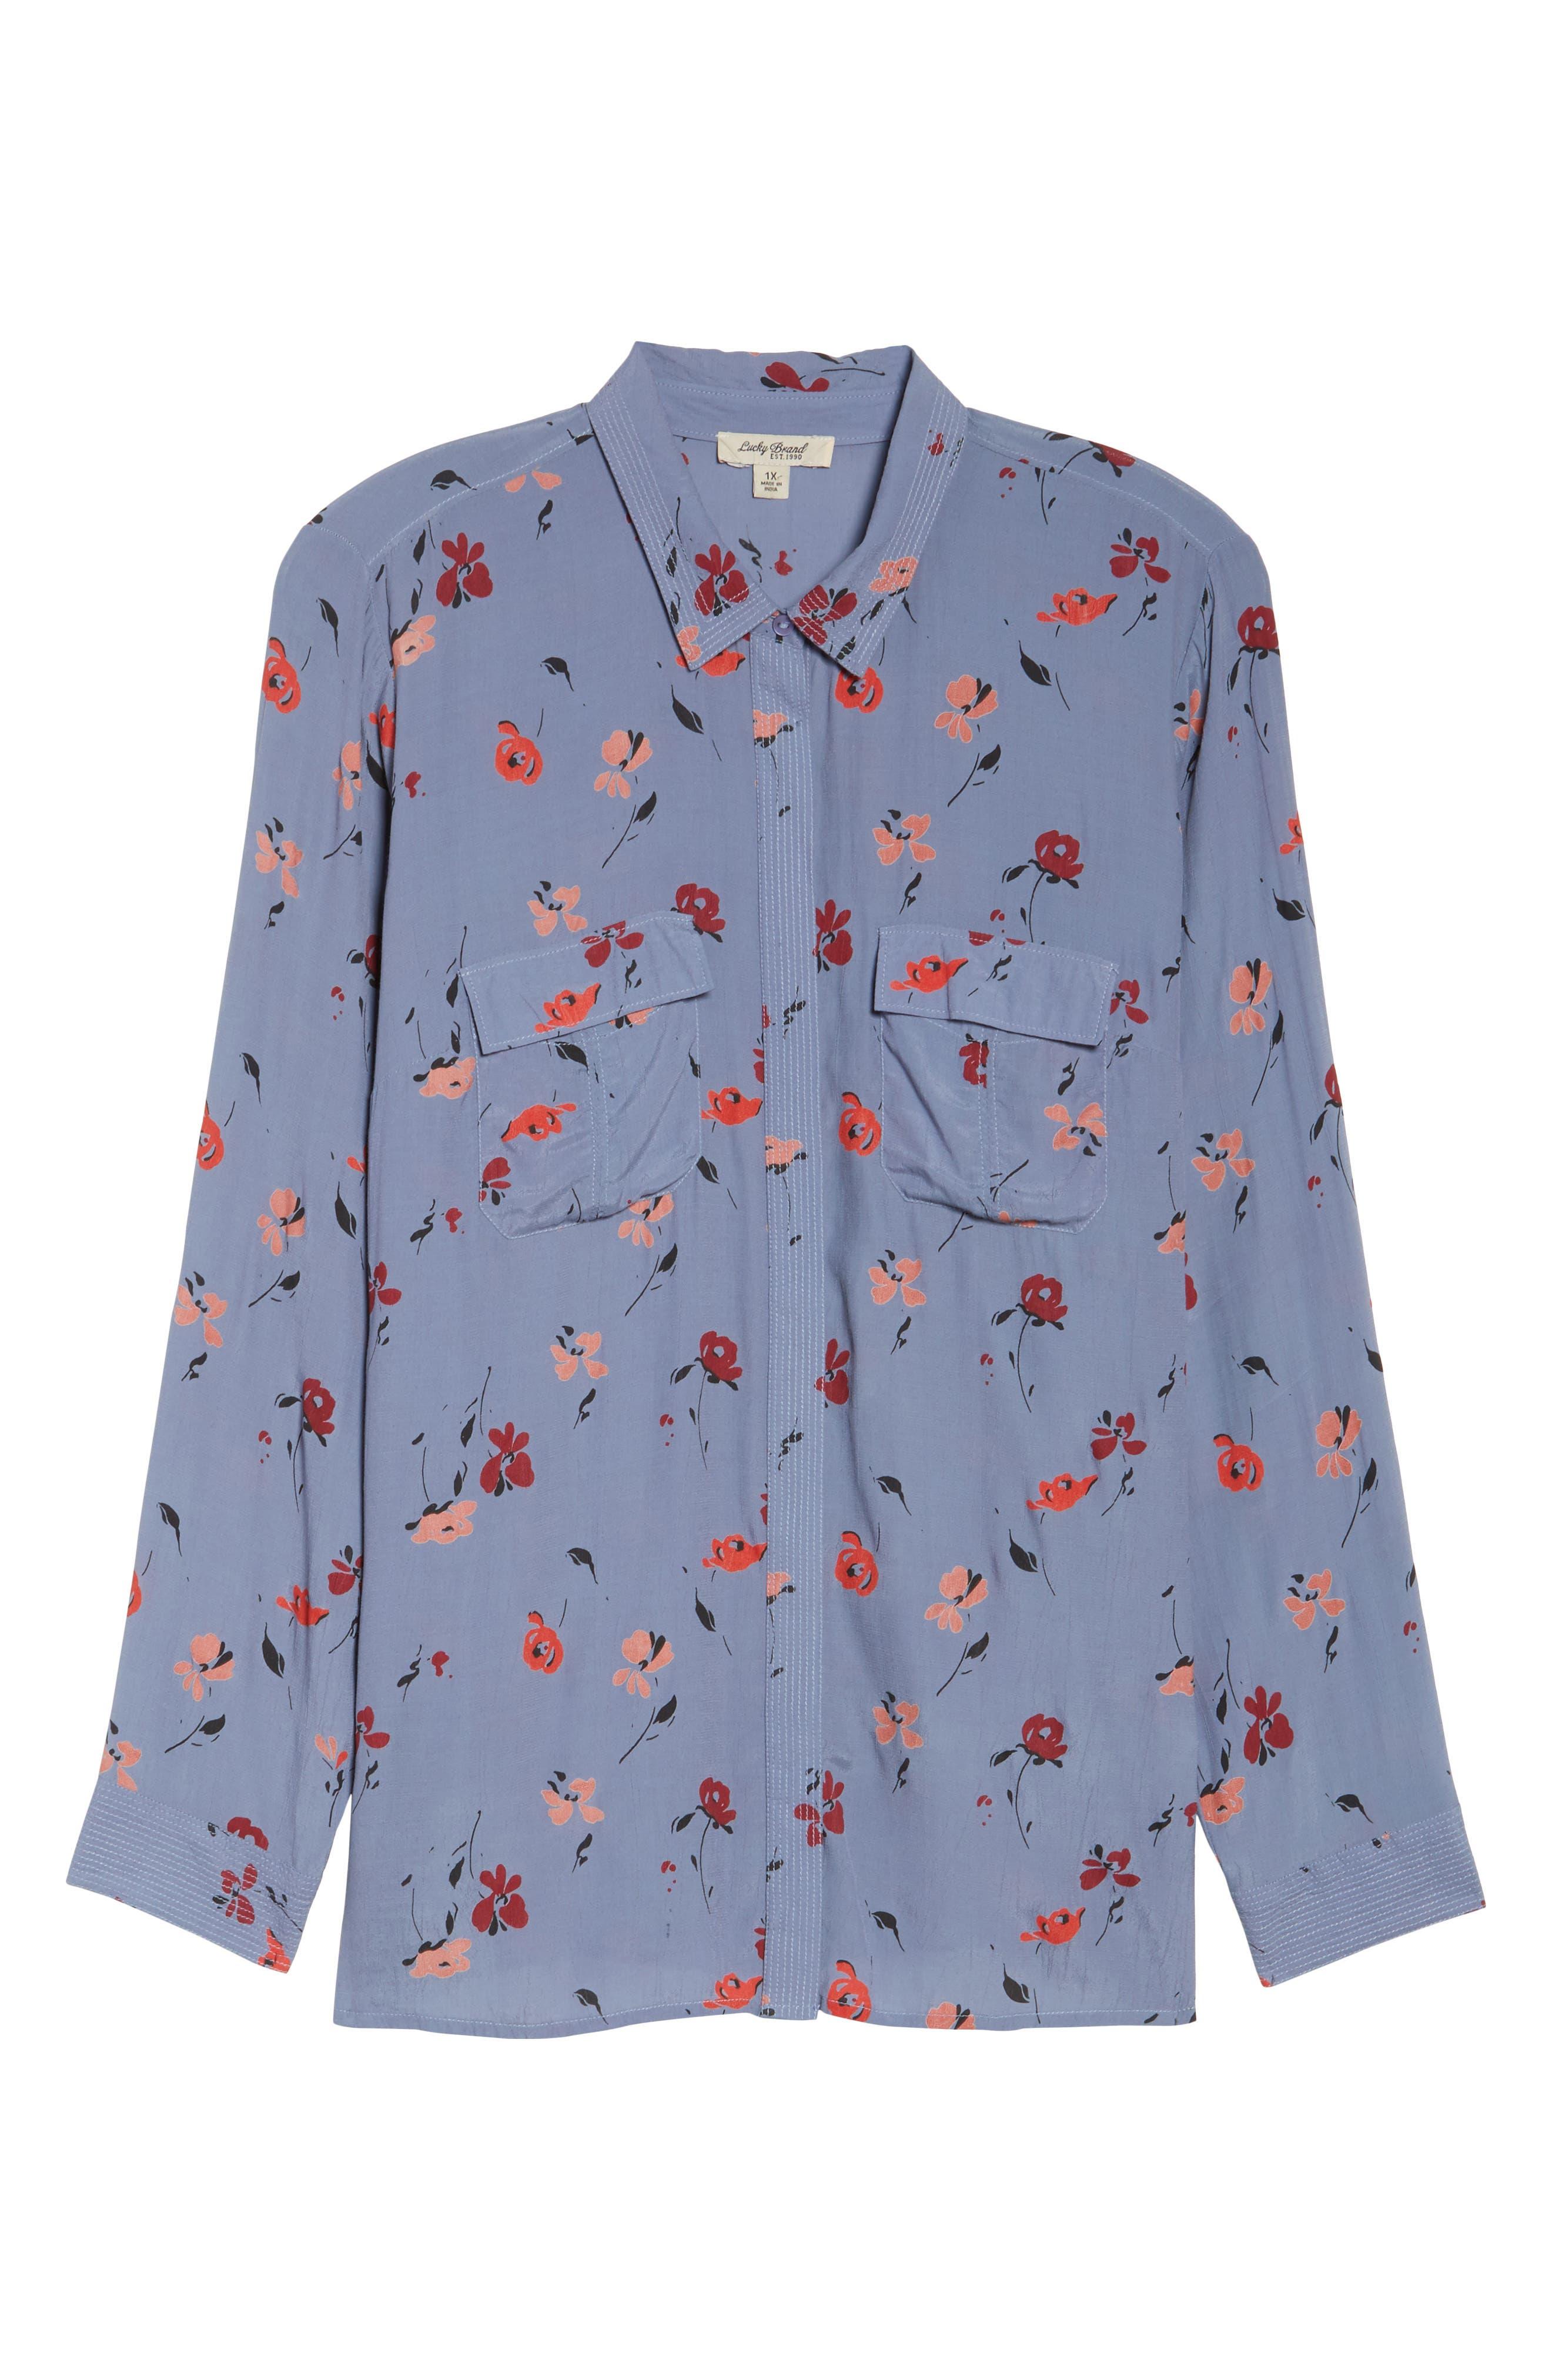 Floral Print Button Down Shirt,                             Alternate thumbnail 6, color,                             Grey Multi